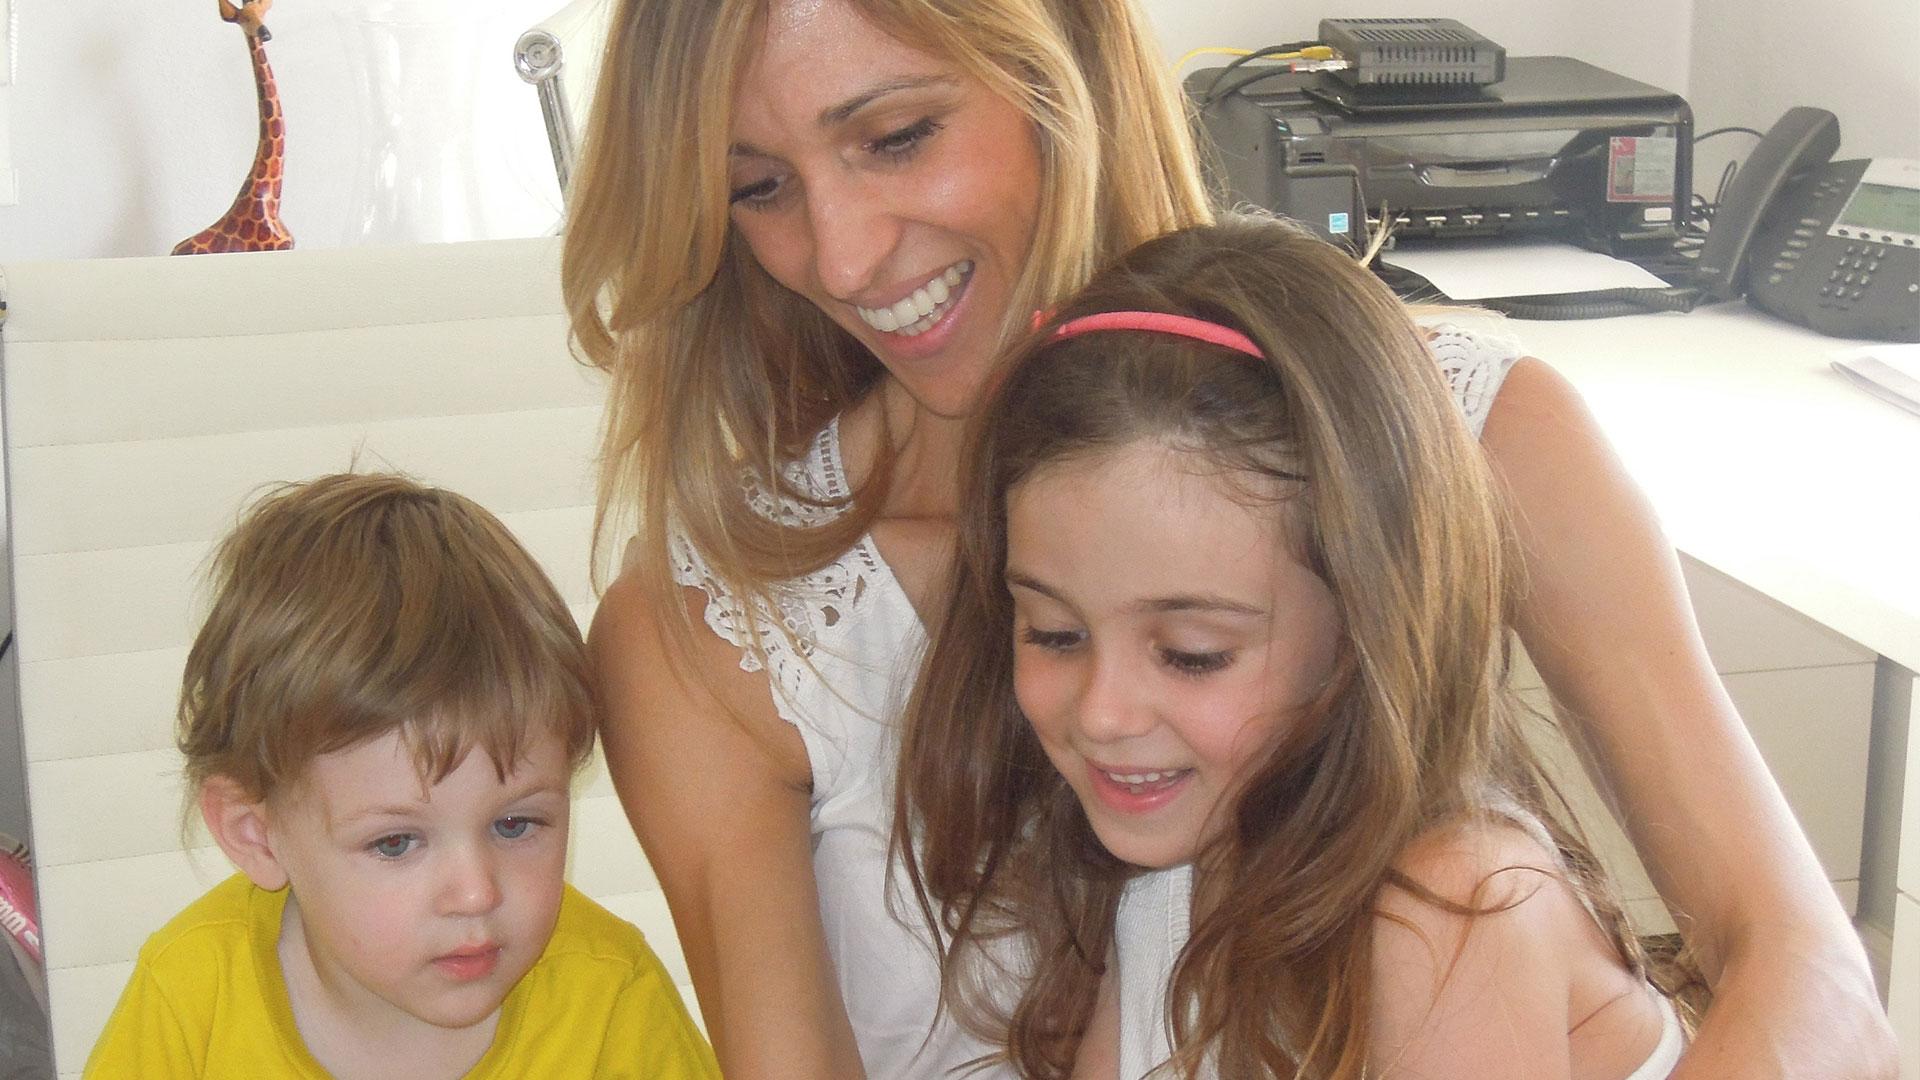 Jessica Claros at her desk with her children